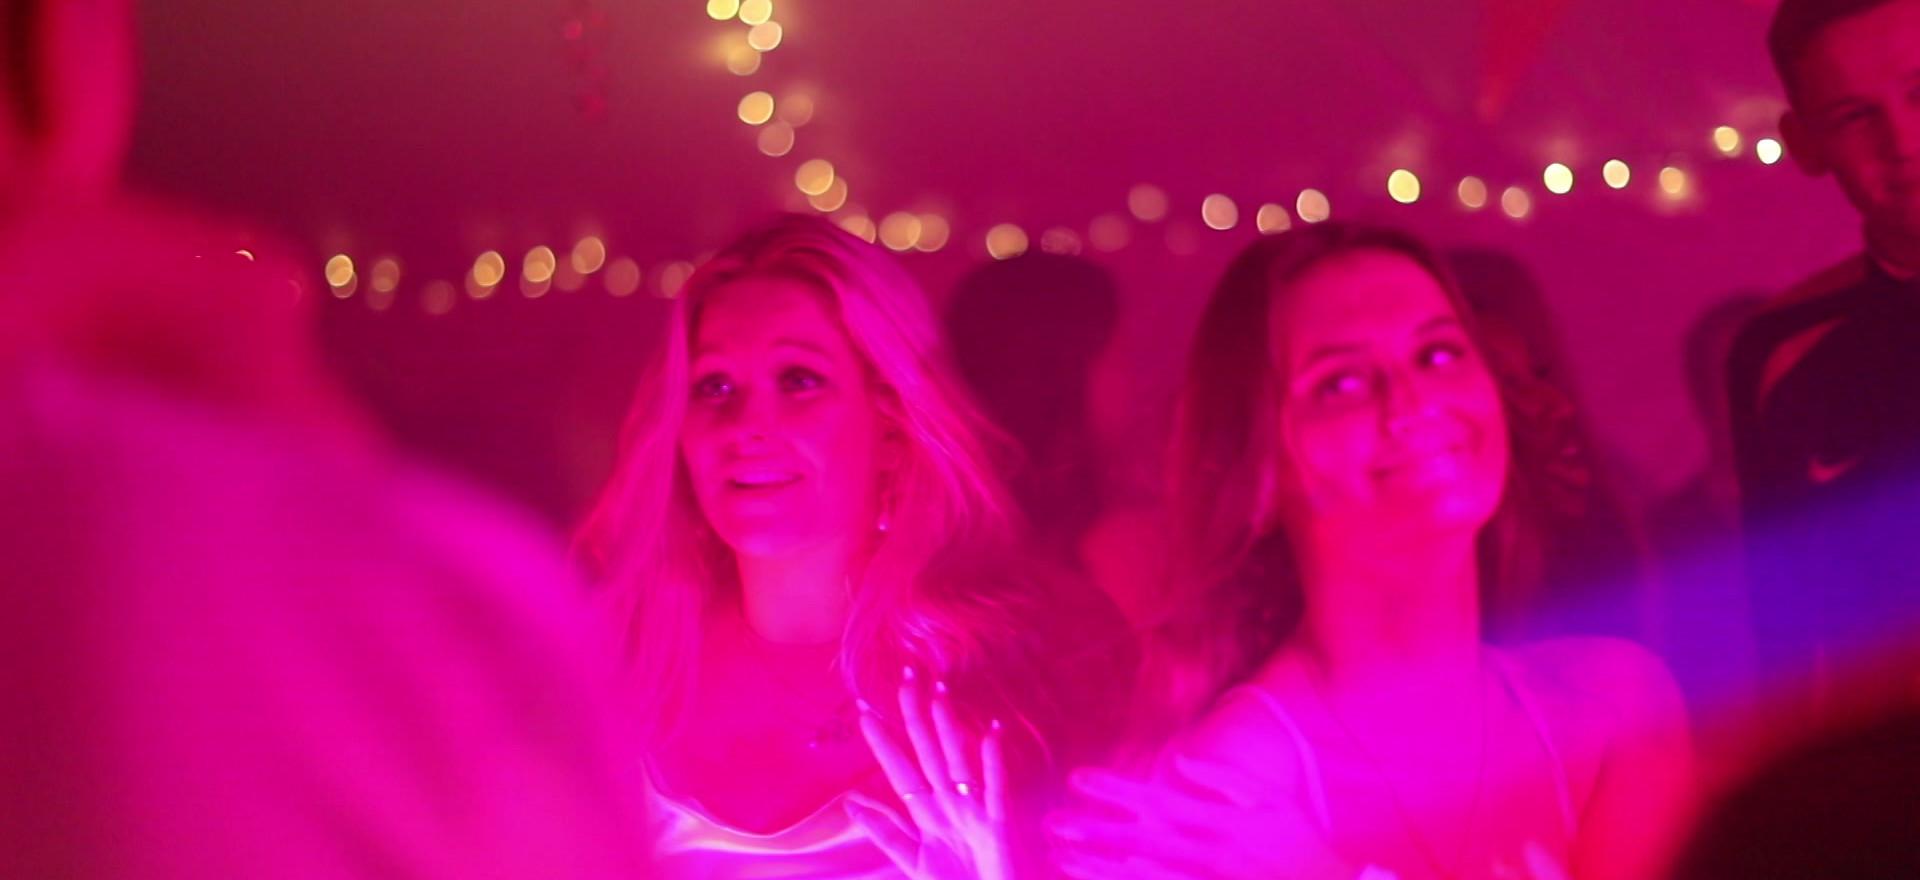 DJ, lyd og lys - for Sofie og Amalie